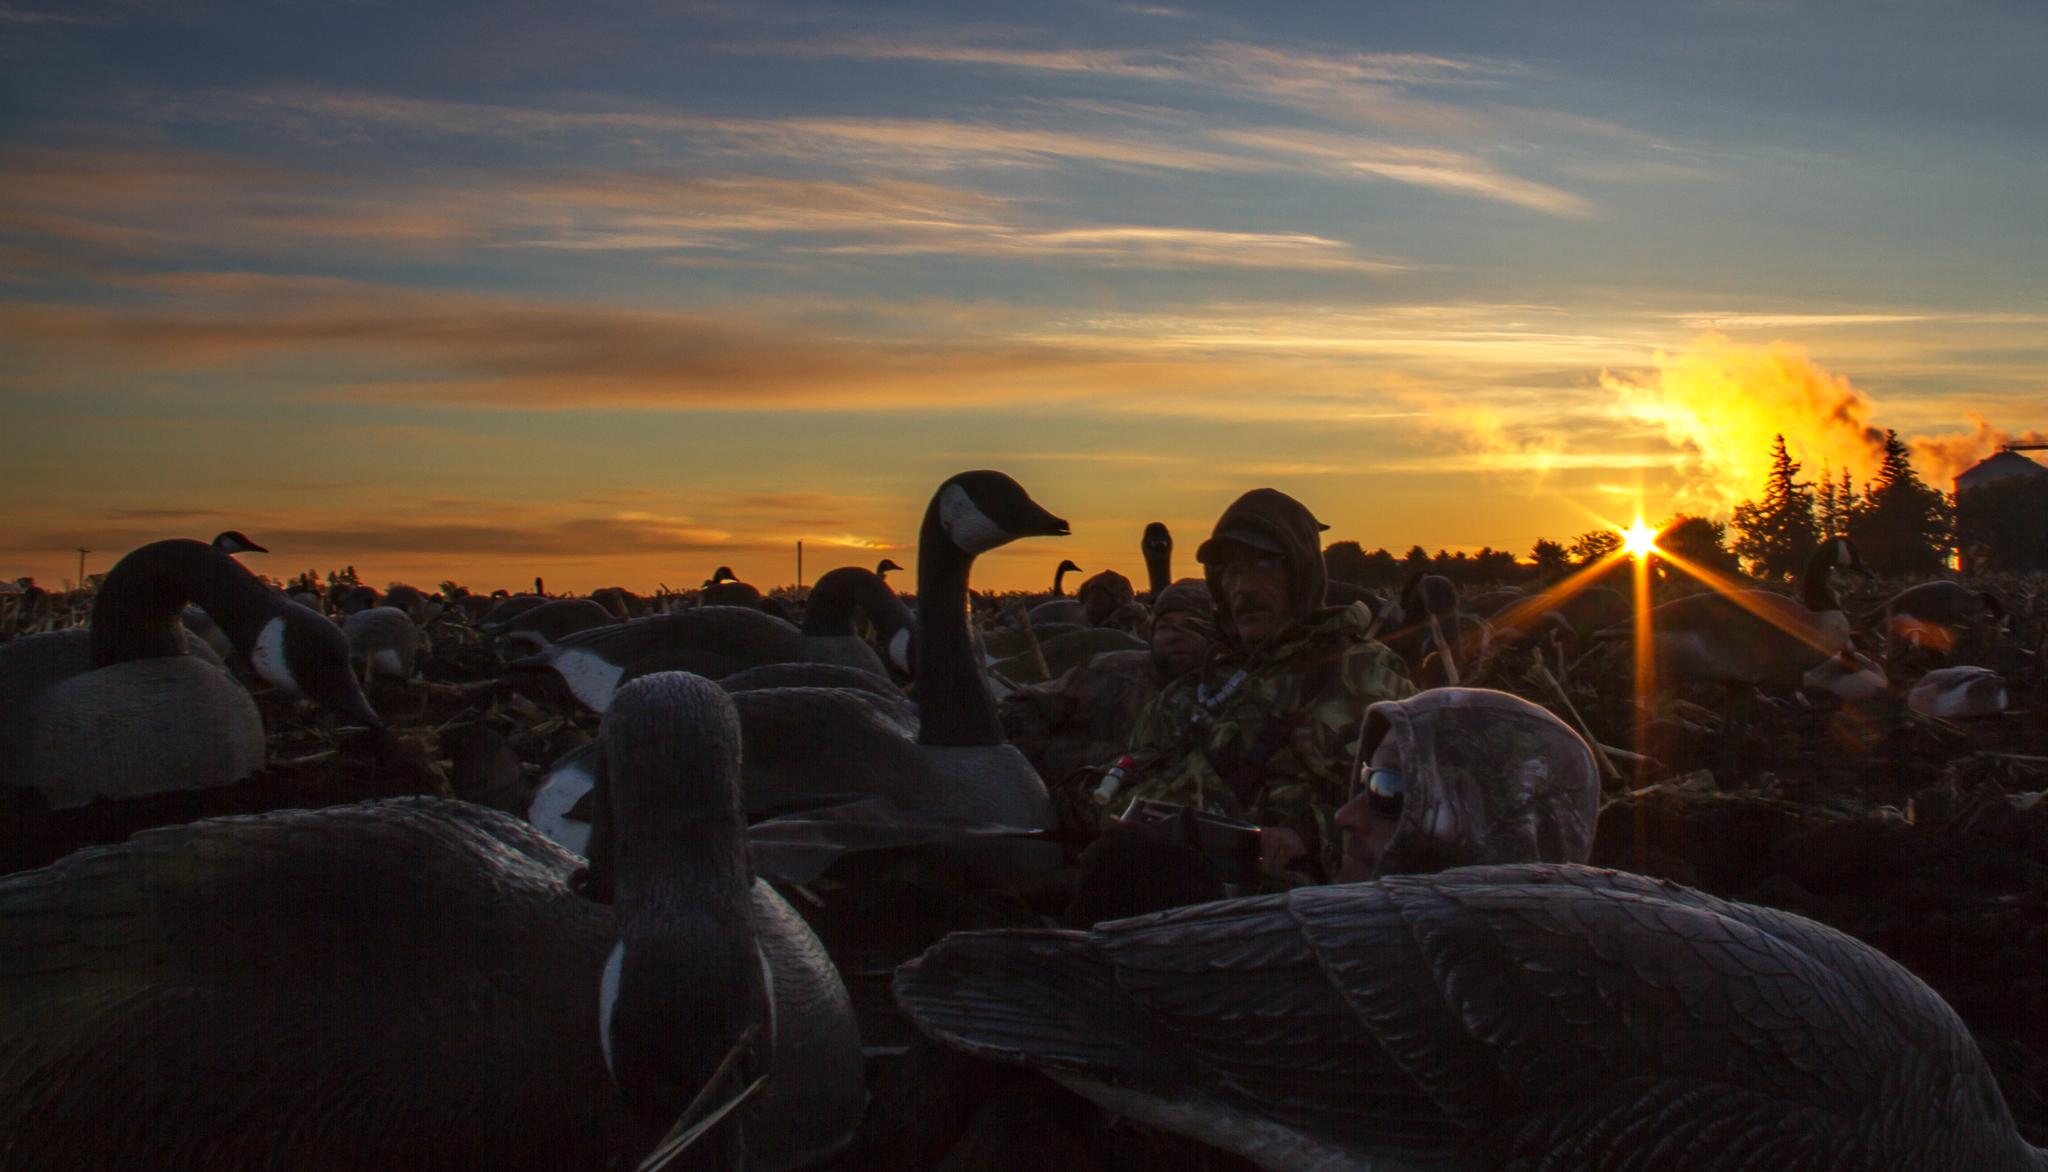 Duck Hunting Desktop Wallpaper Owatonna minnesota goose hunt 2048x1172